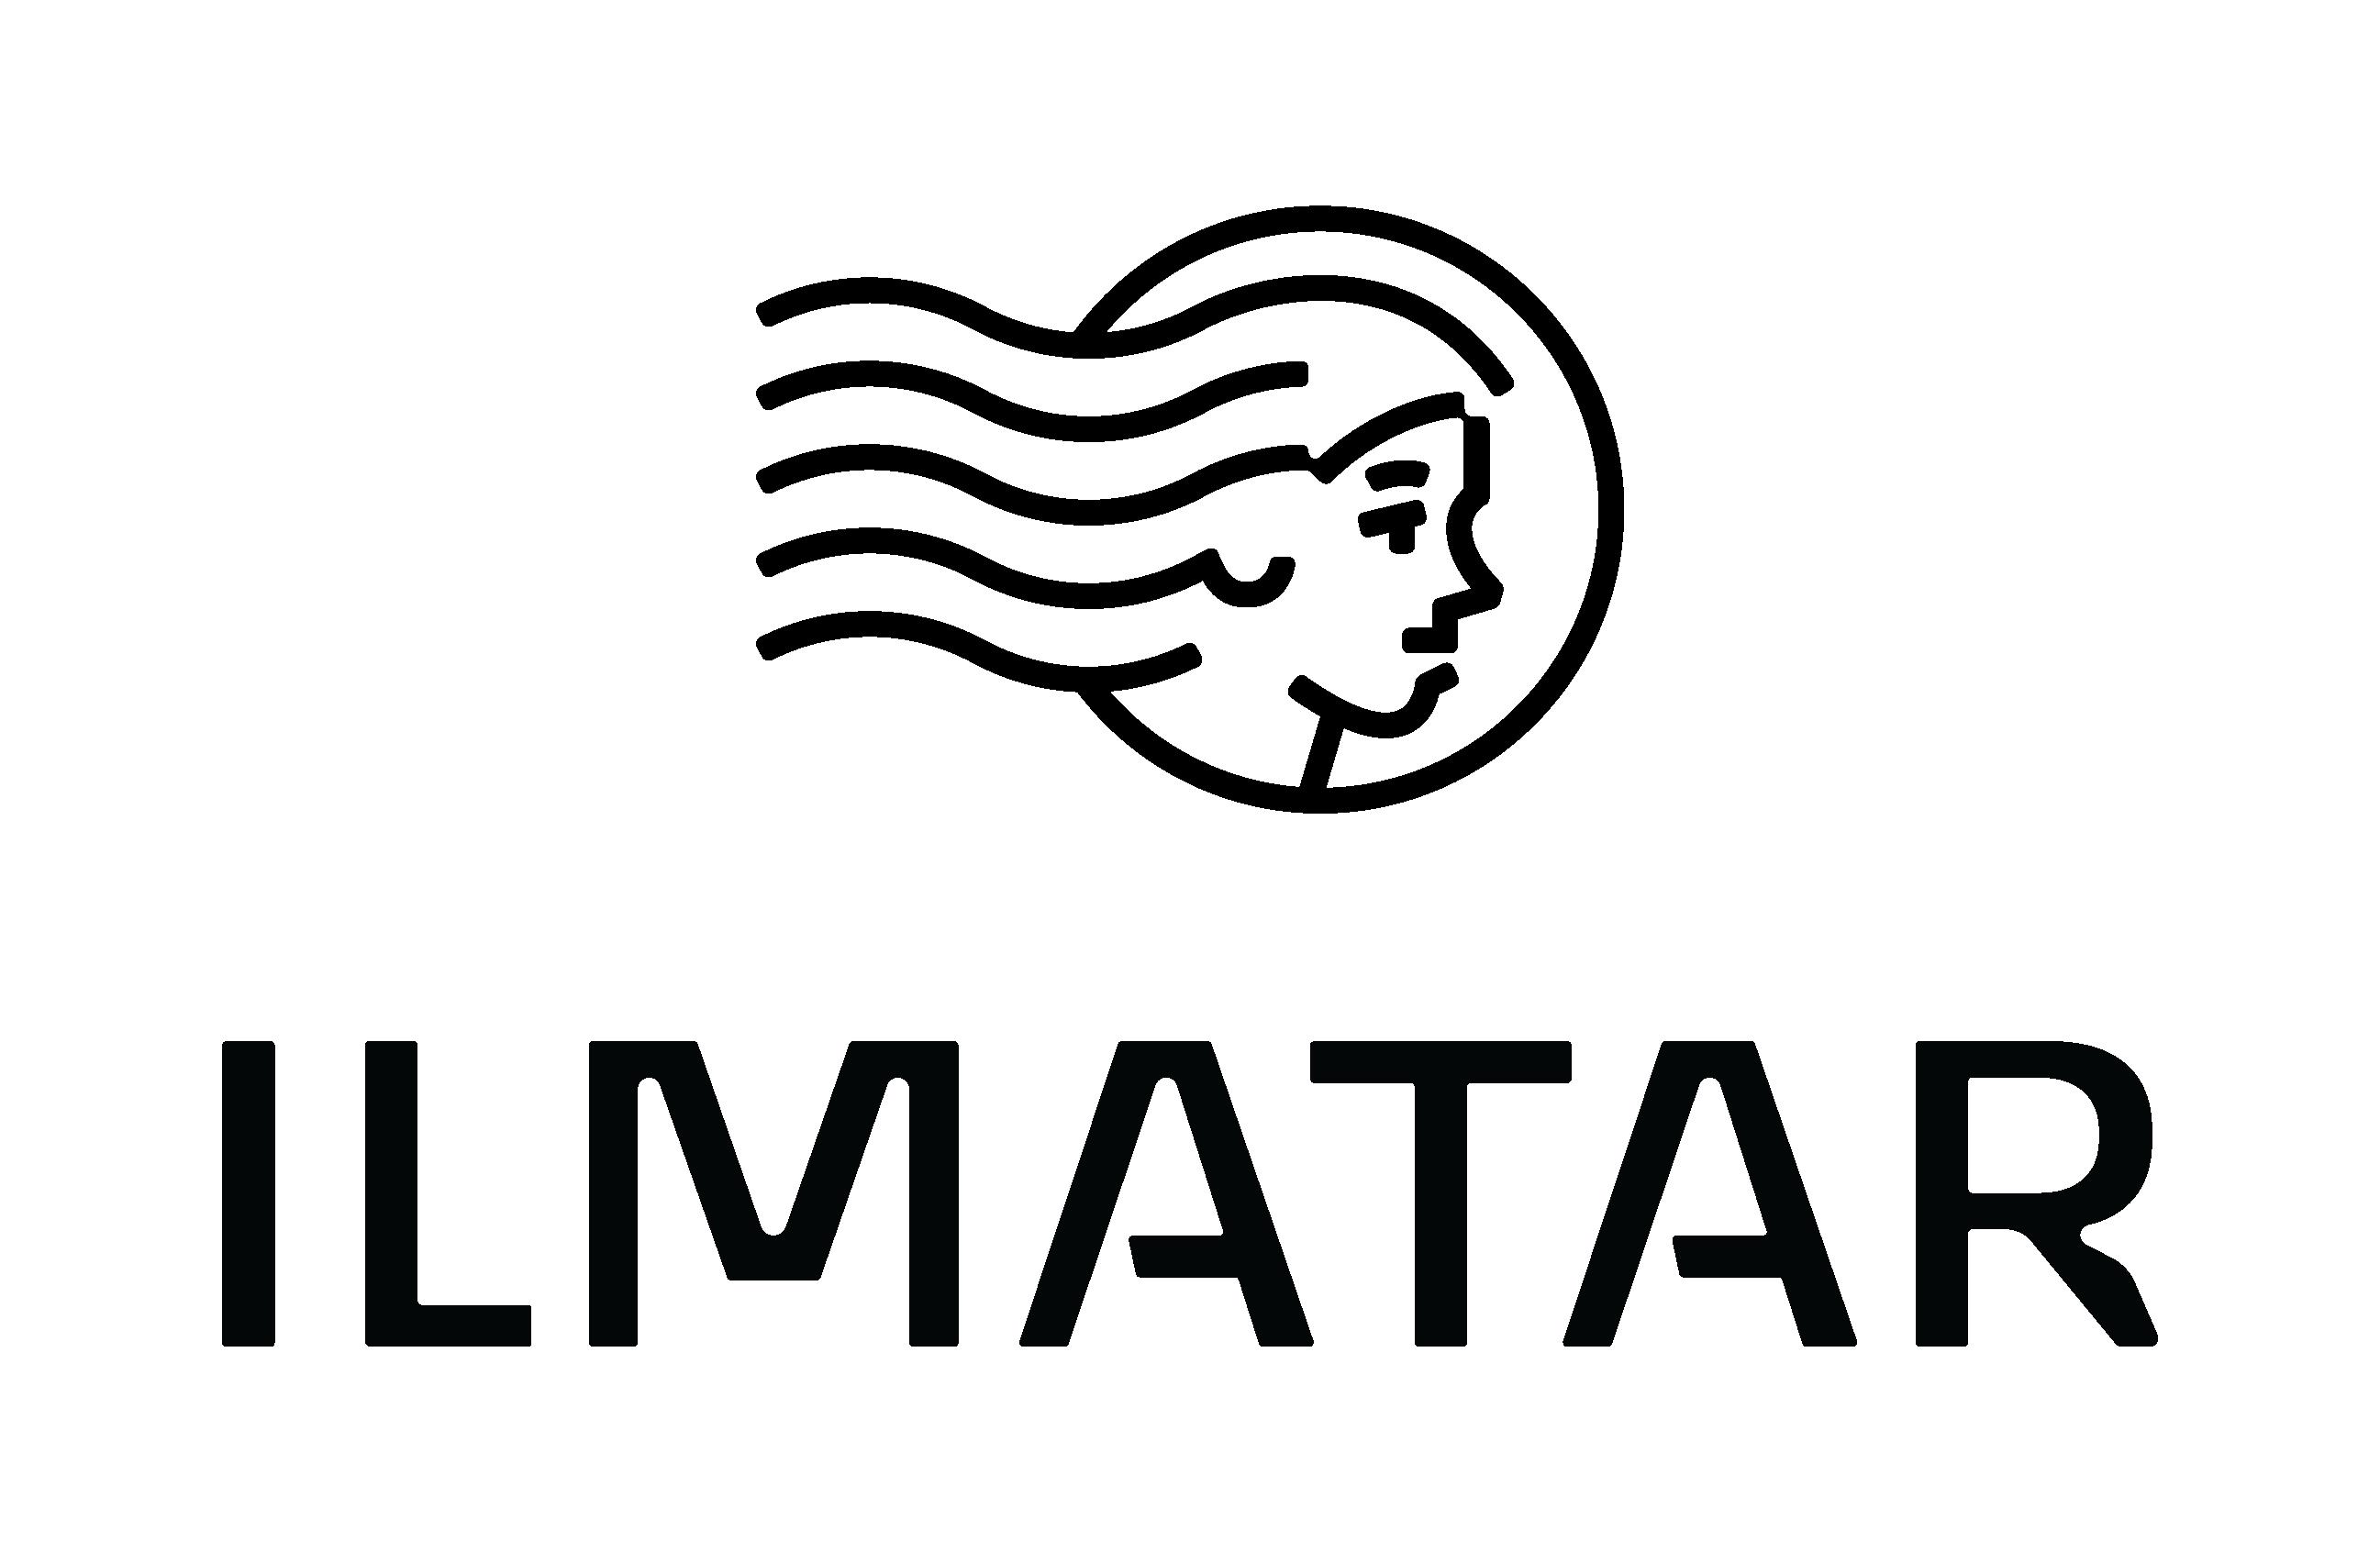 ilmatar_logo-emblem_black-002.png (68 KB)